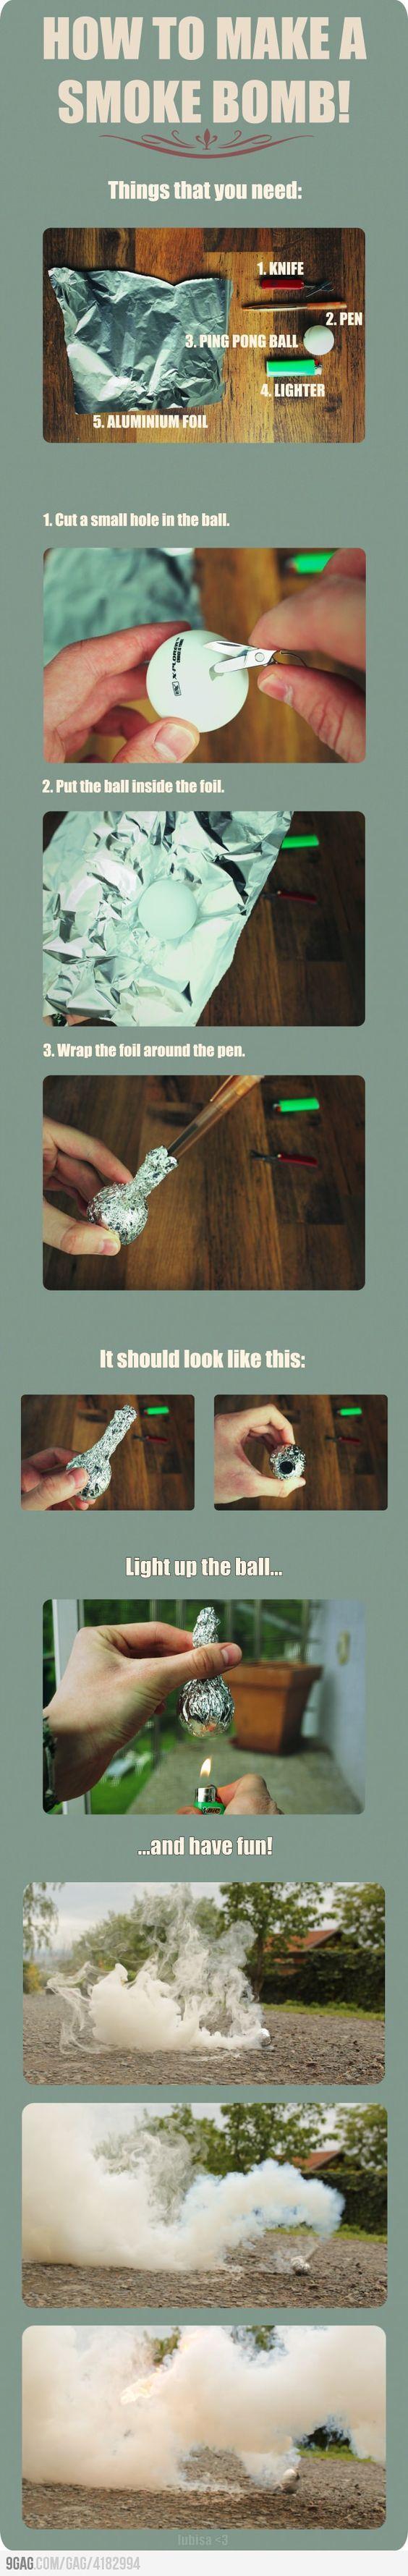 how to make smoke bom